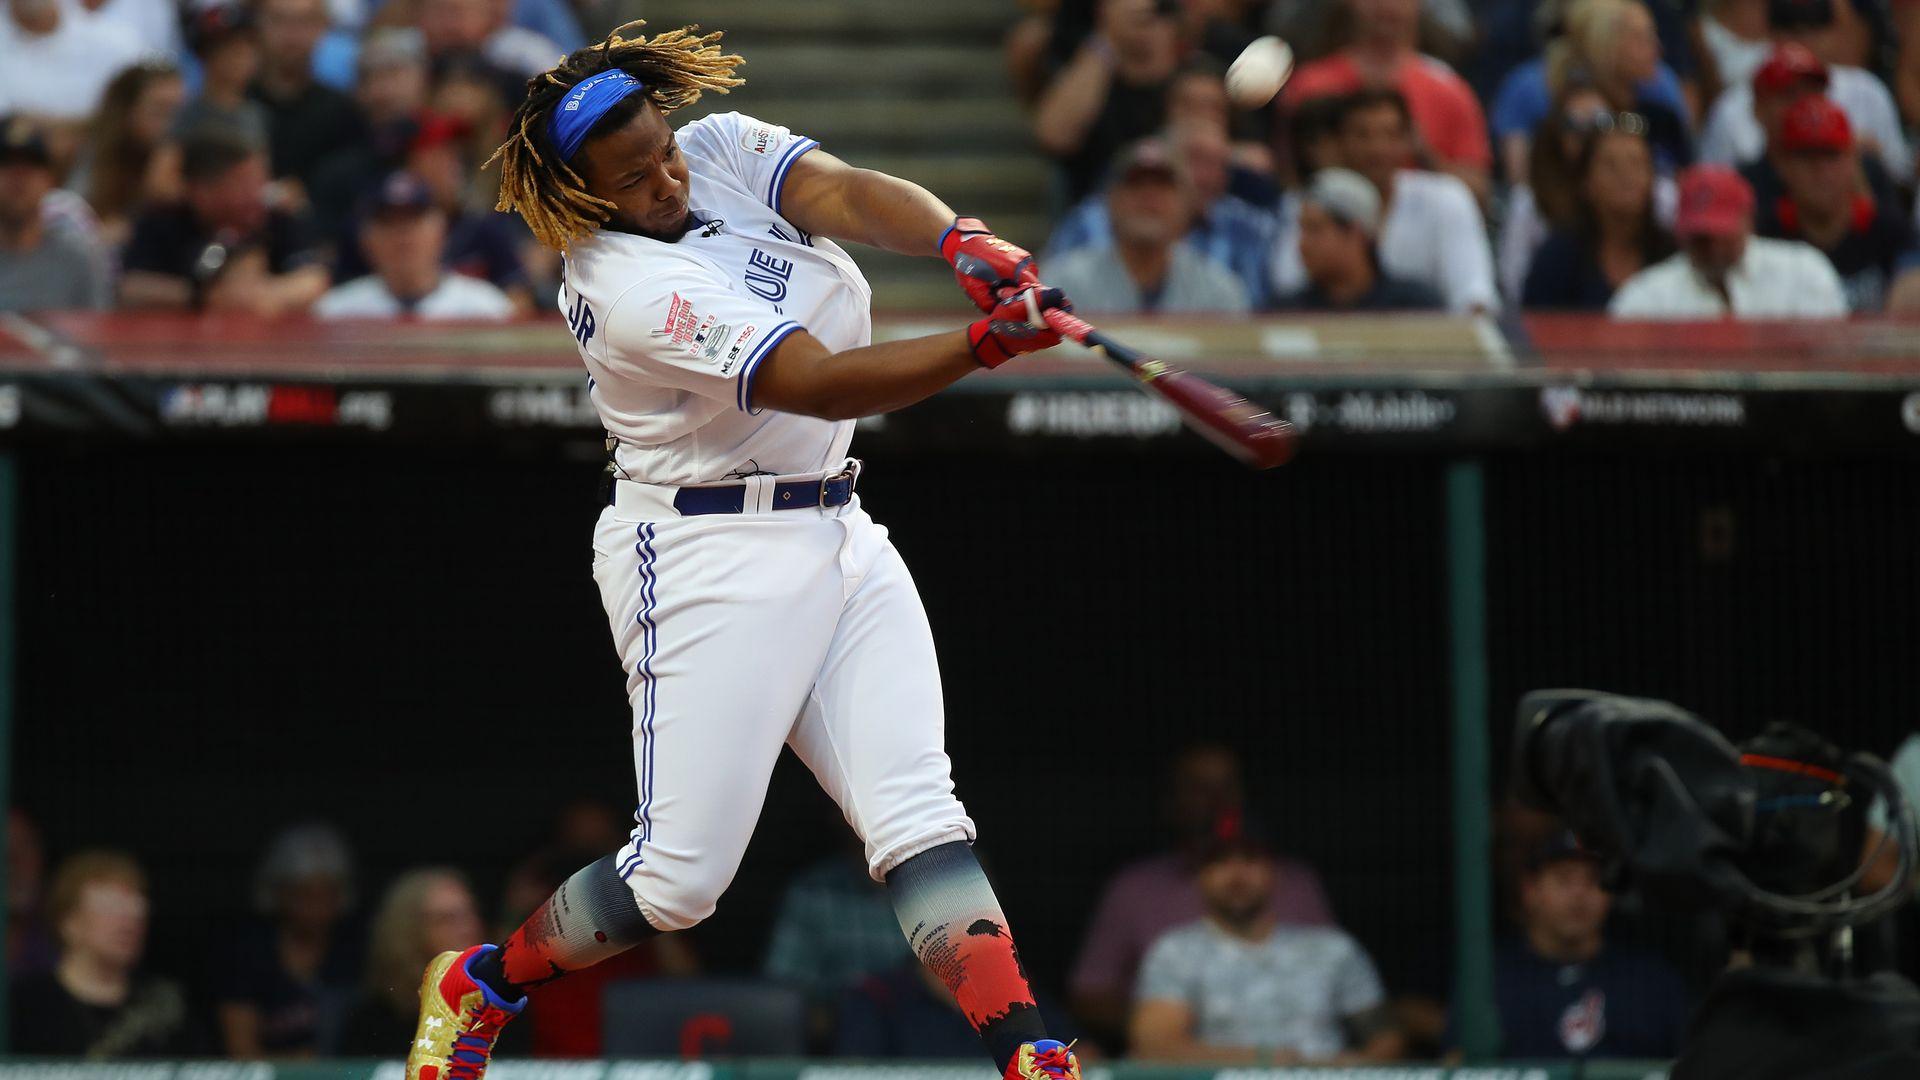 Vladimir Guerrero Jr swinging the bat